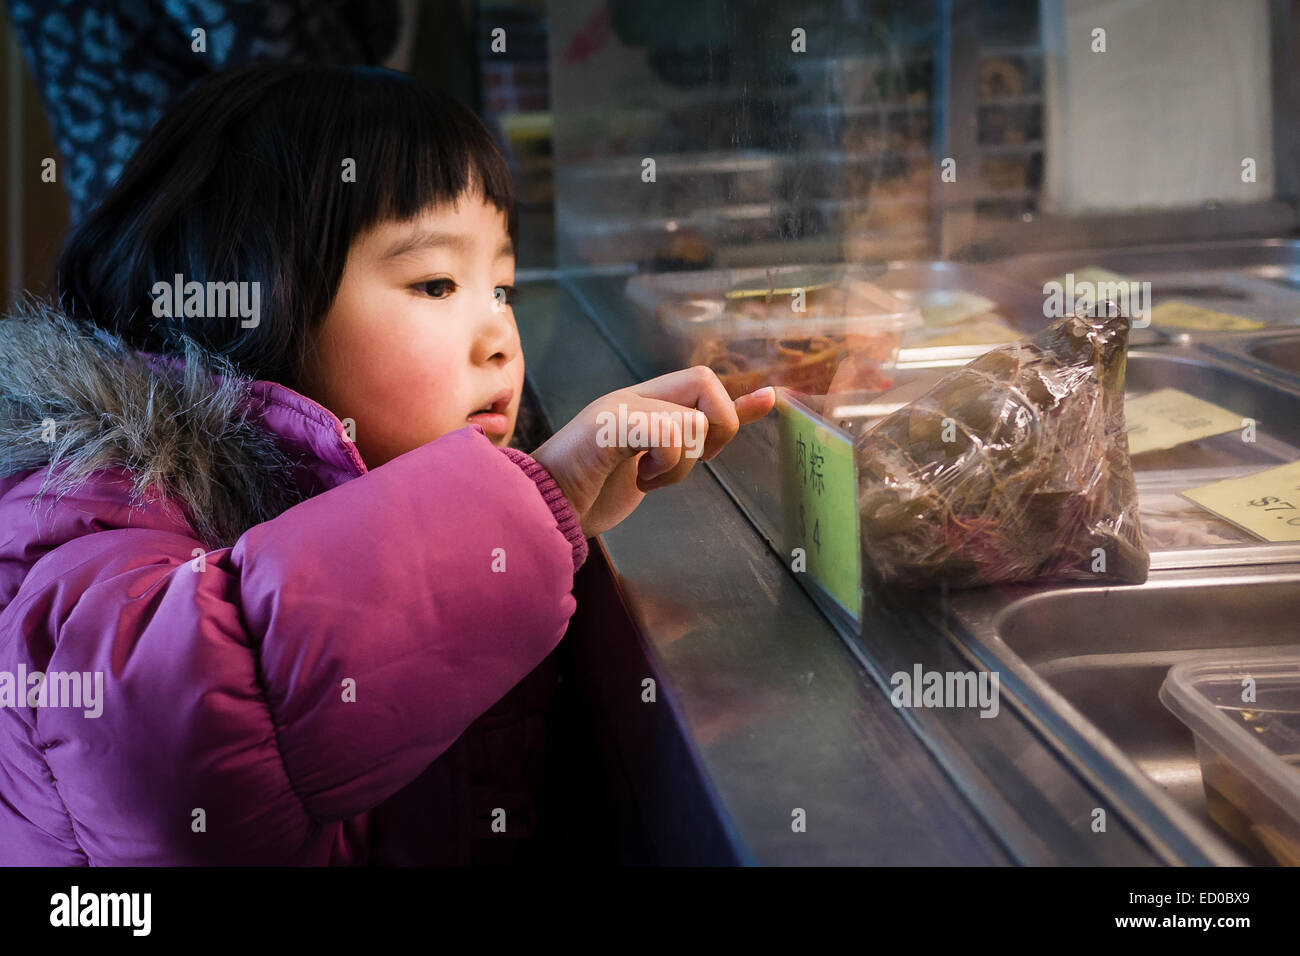 Mädchen mit rosa Jacke Blick auf display Stockbild